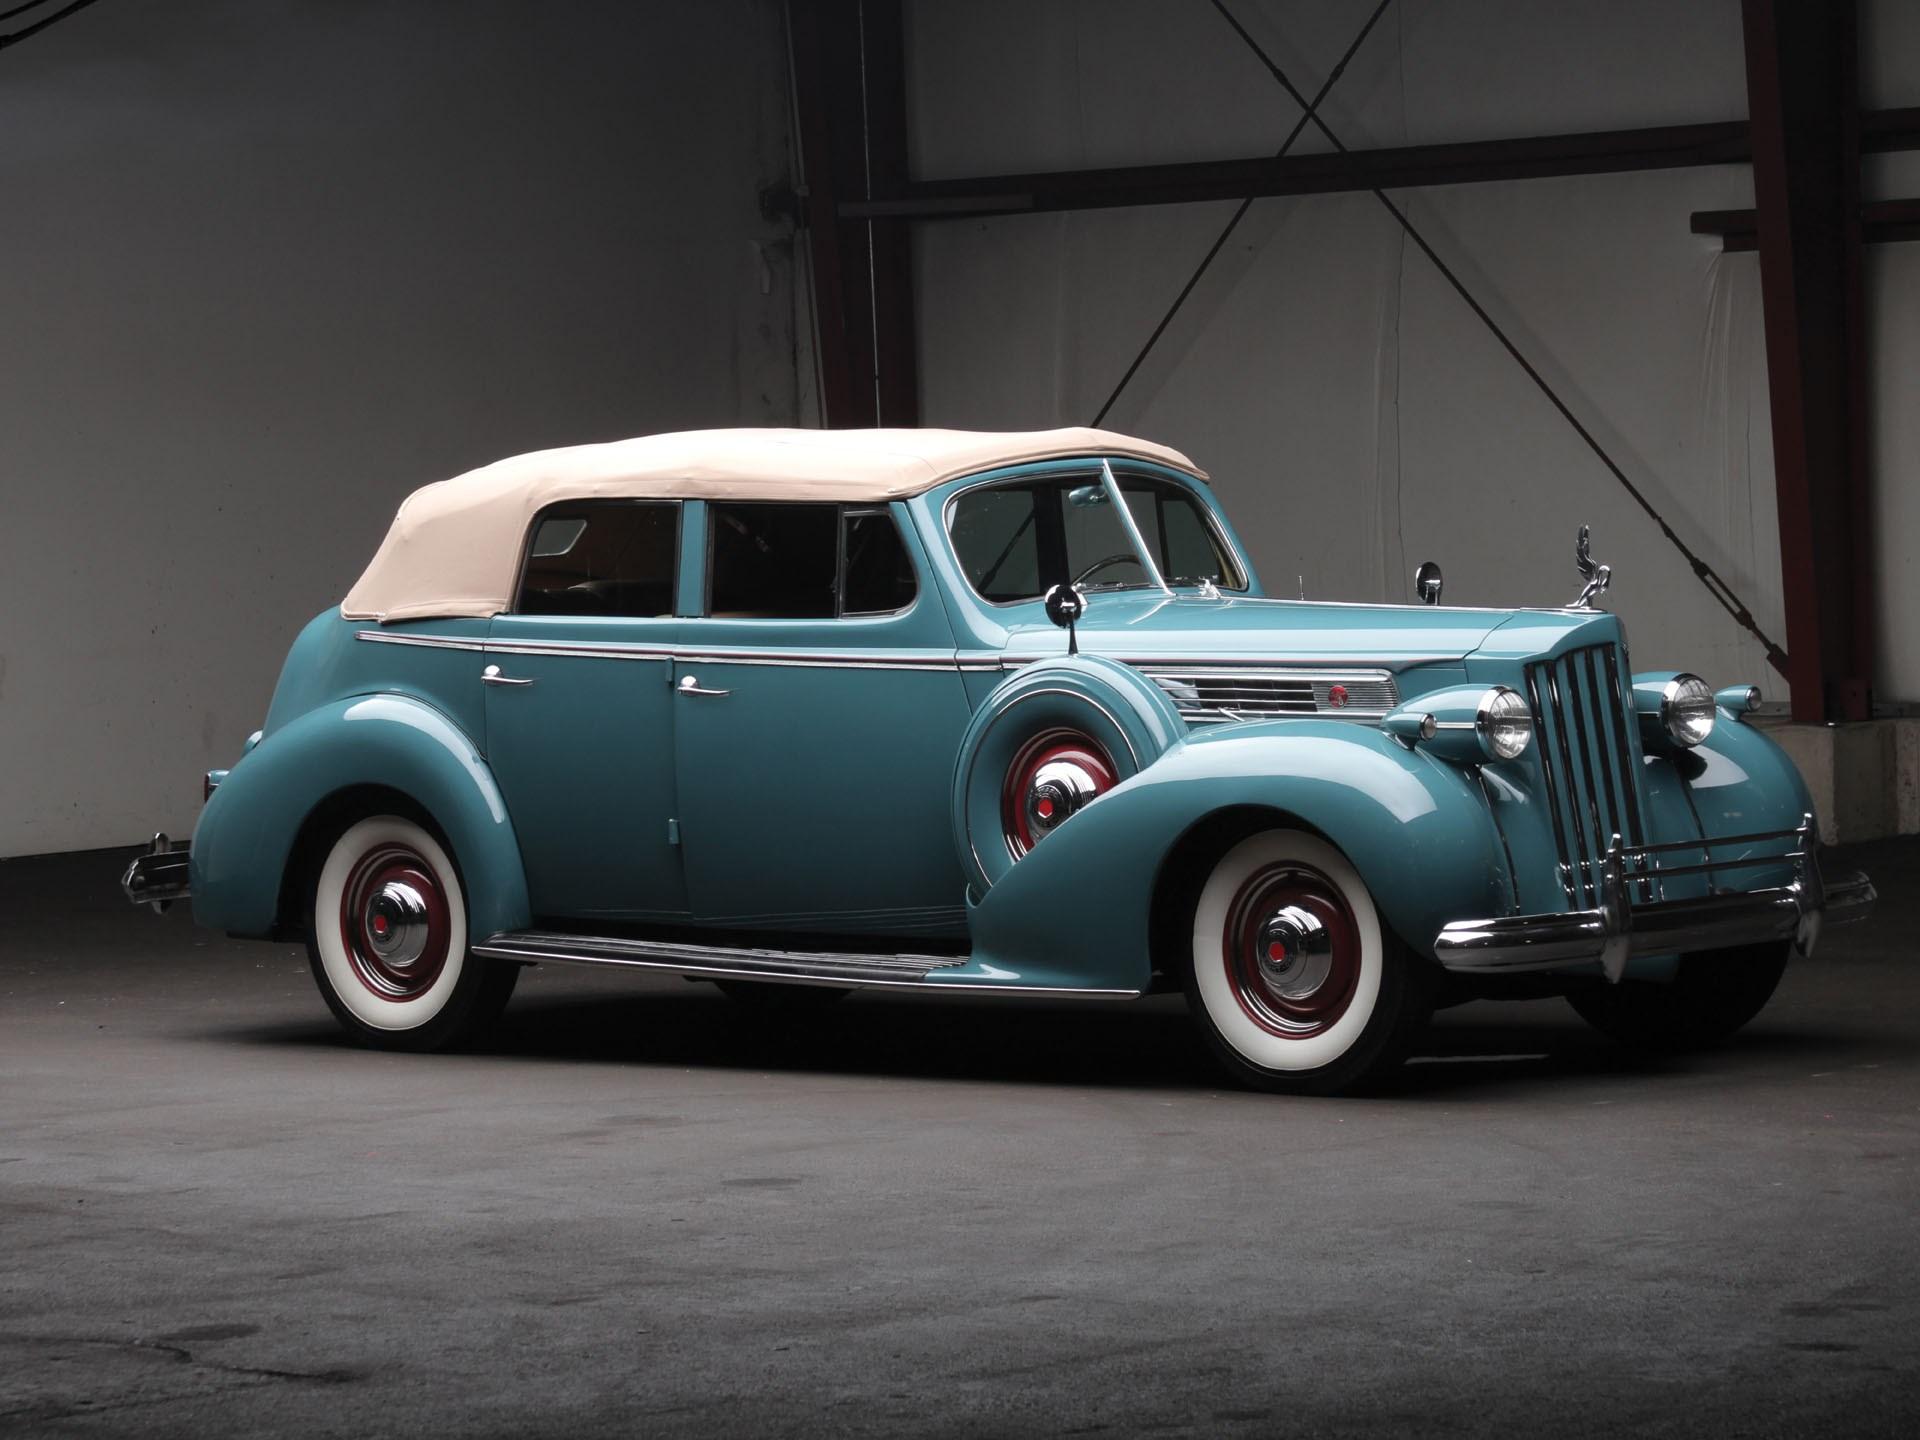 RM Sotheby's - 1939 Packard Super Eight | Auburn Spring 2014